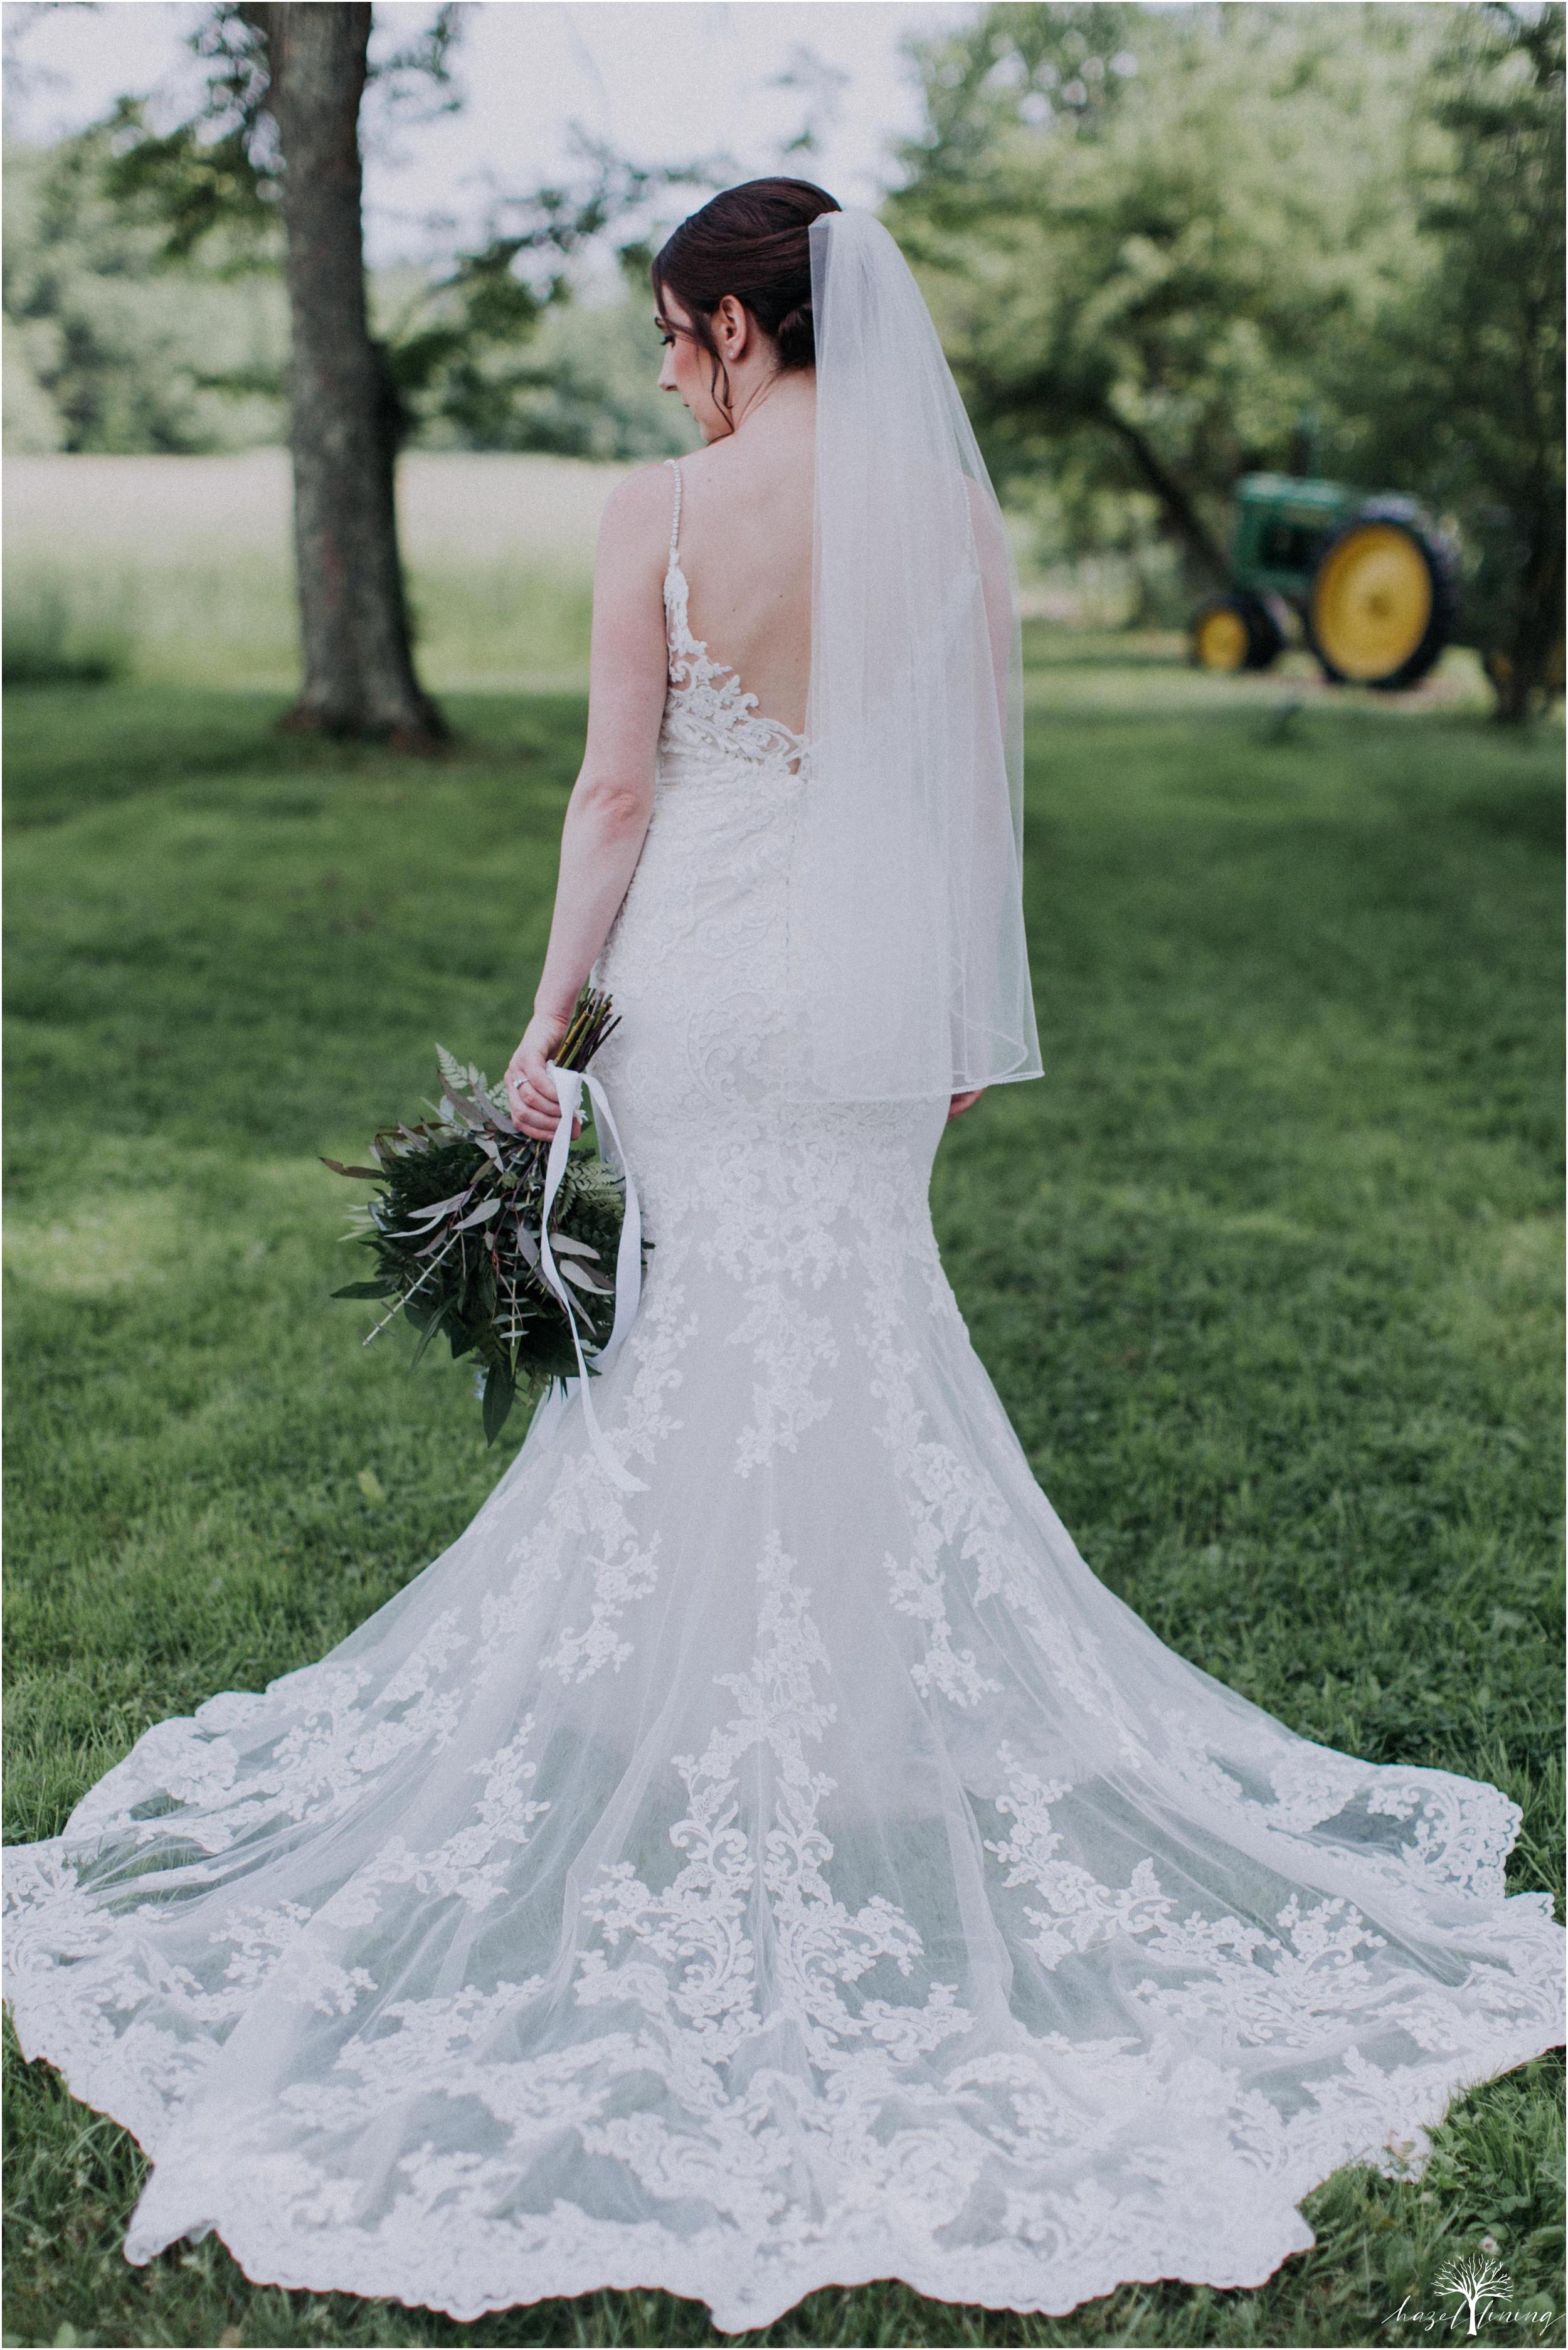 hazel-lining-travel-wedding-elopement-photography-lisa-landon-shoemaker-the-farm-bakery-and-events-bucks-county-quakertown-pennsylvania-summer-country-outdoor-farm-wedding_0020.jpg